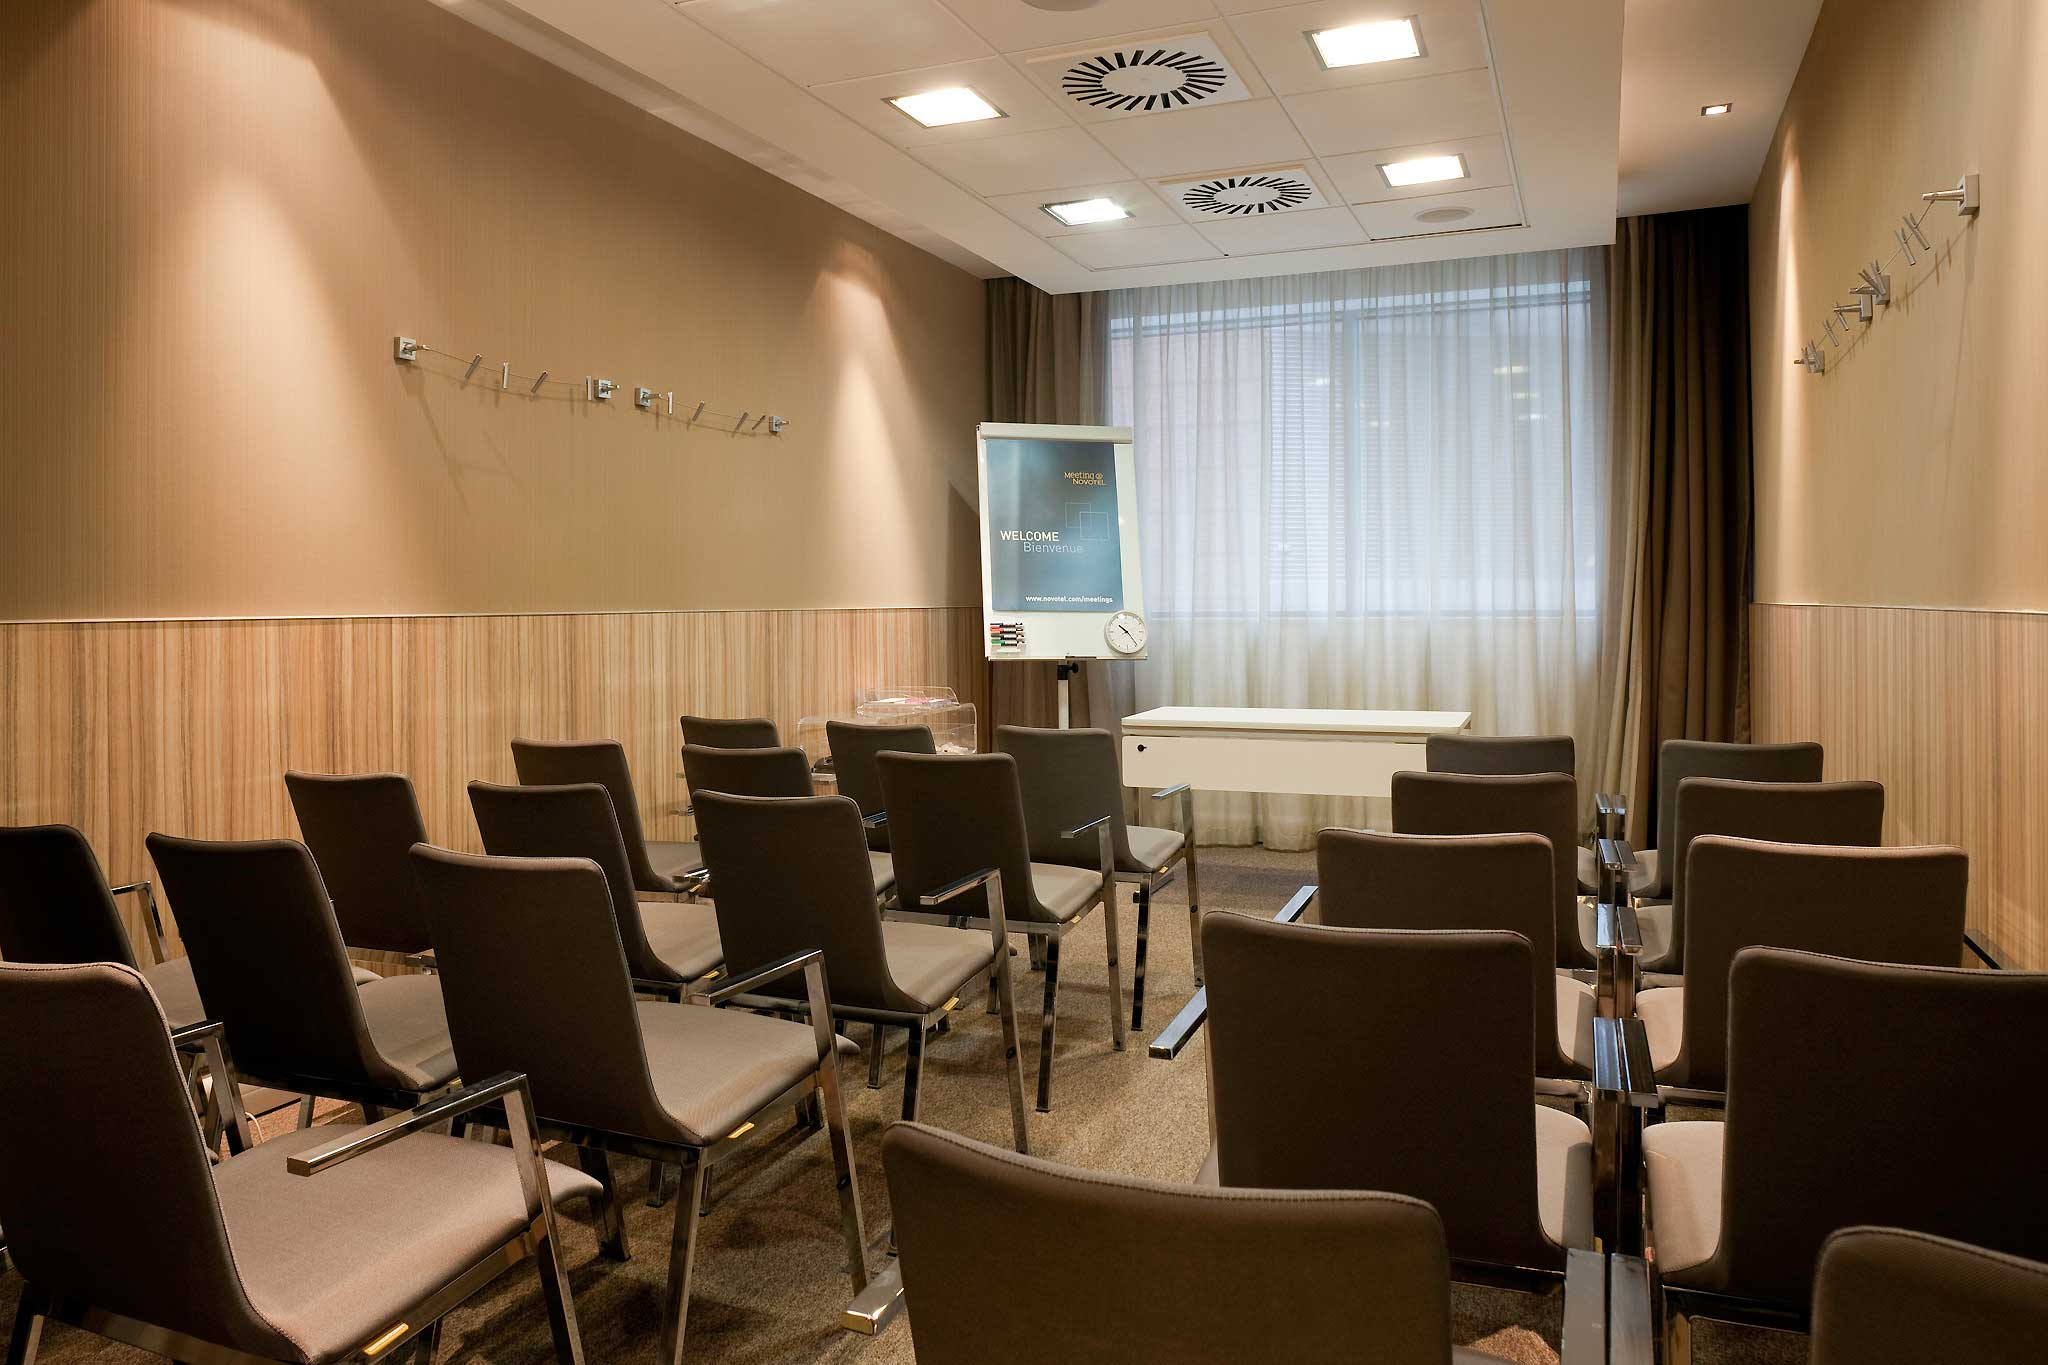 Novotel Liverpool Sala de conferências